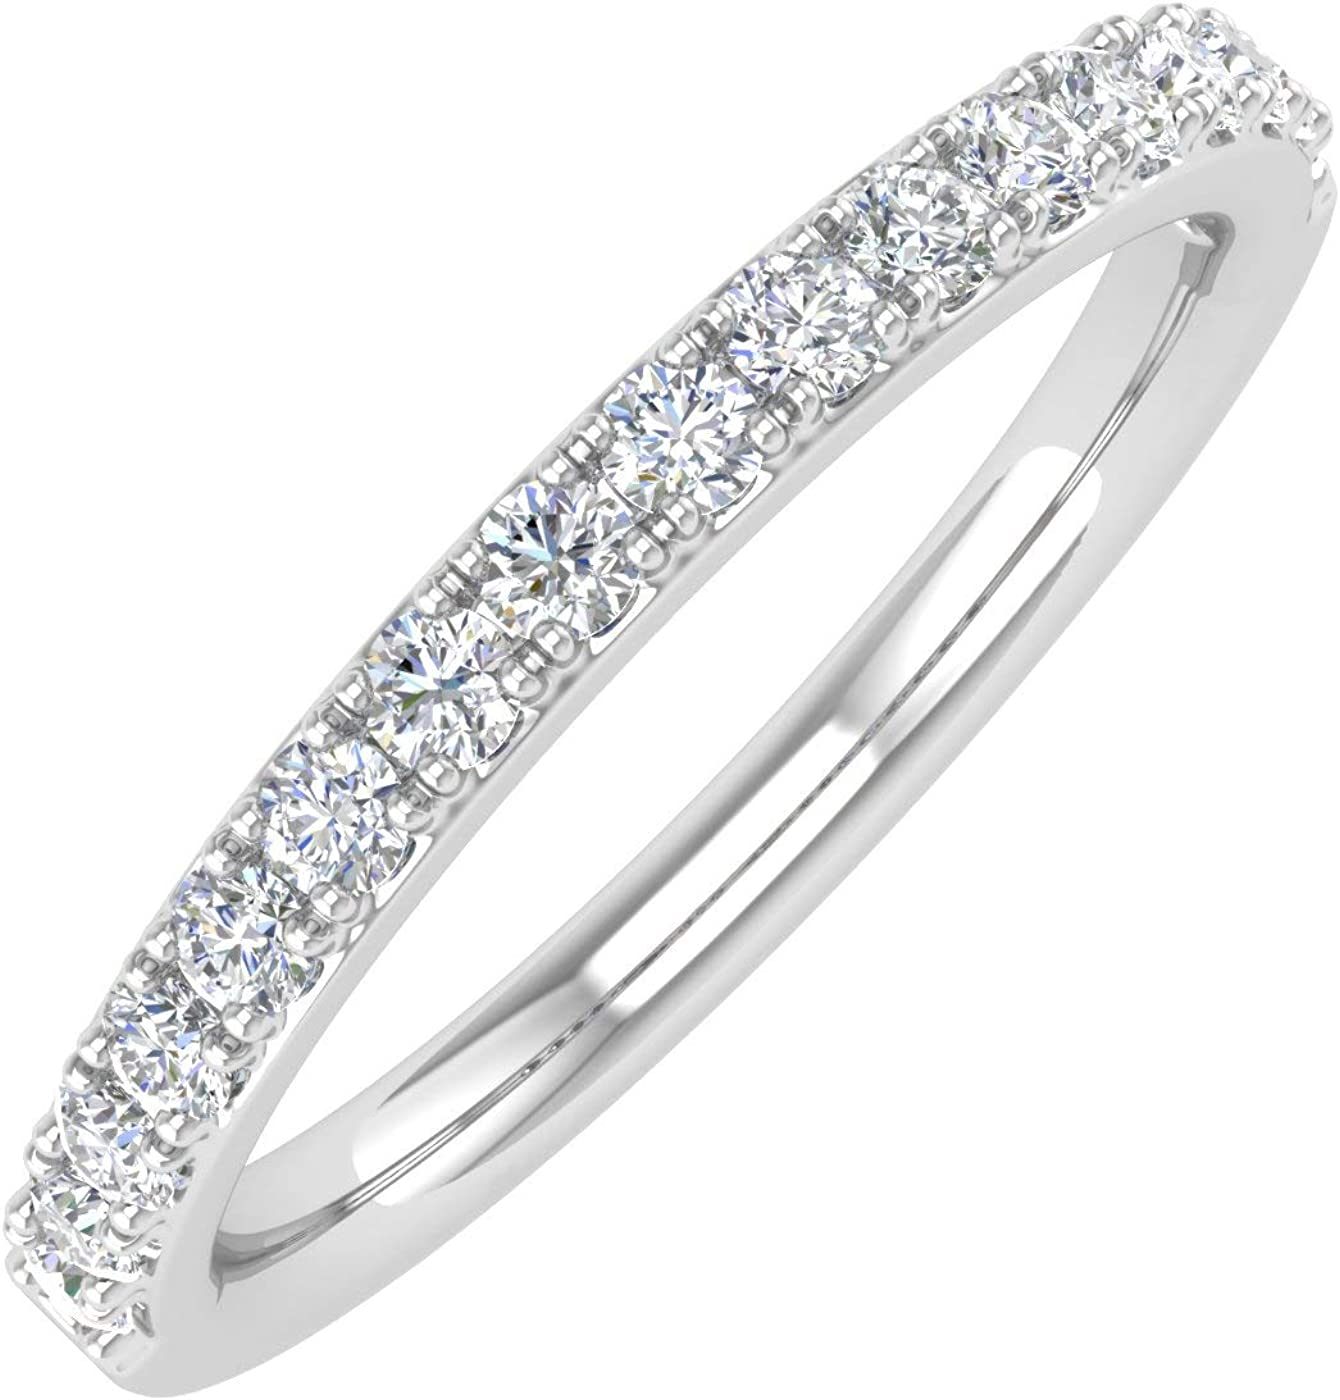 1/4 Carat Diamond Anniversary Wedding Band in 14K Gold